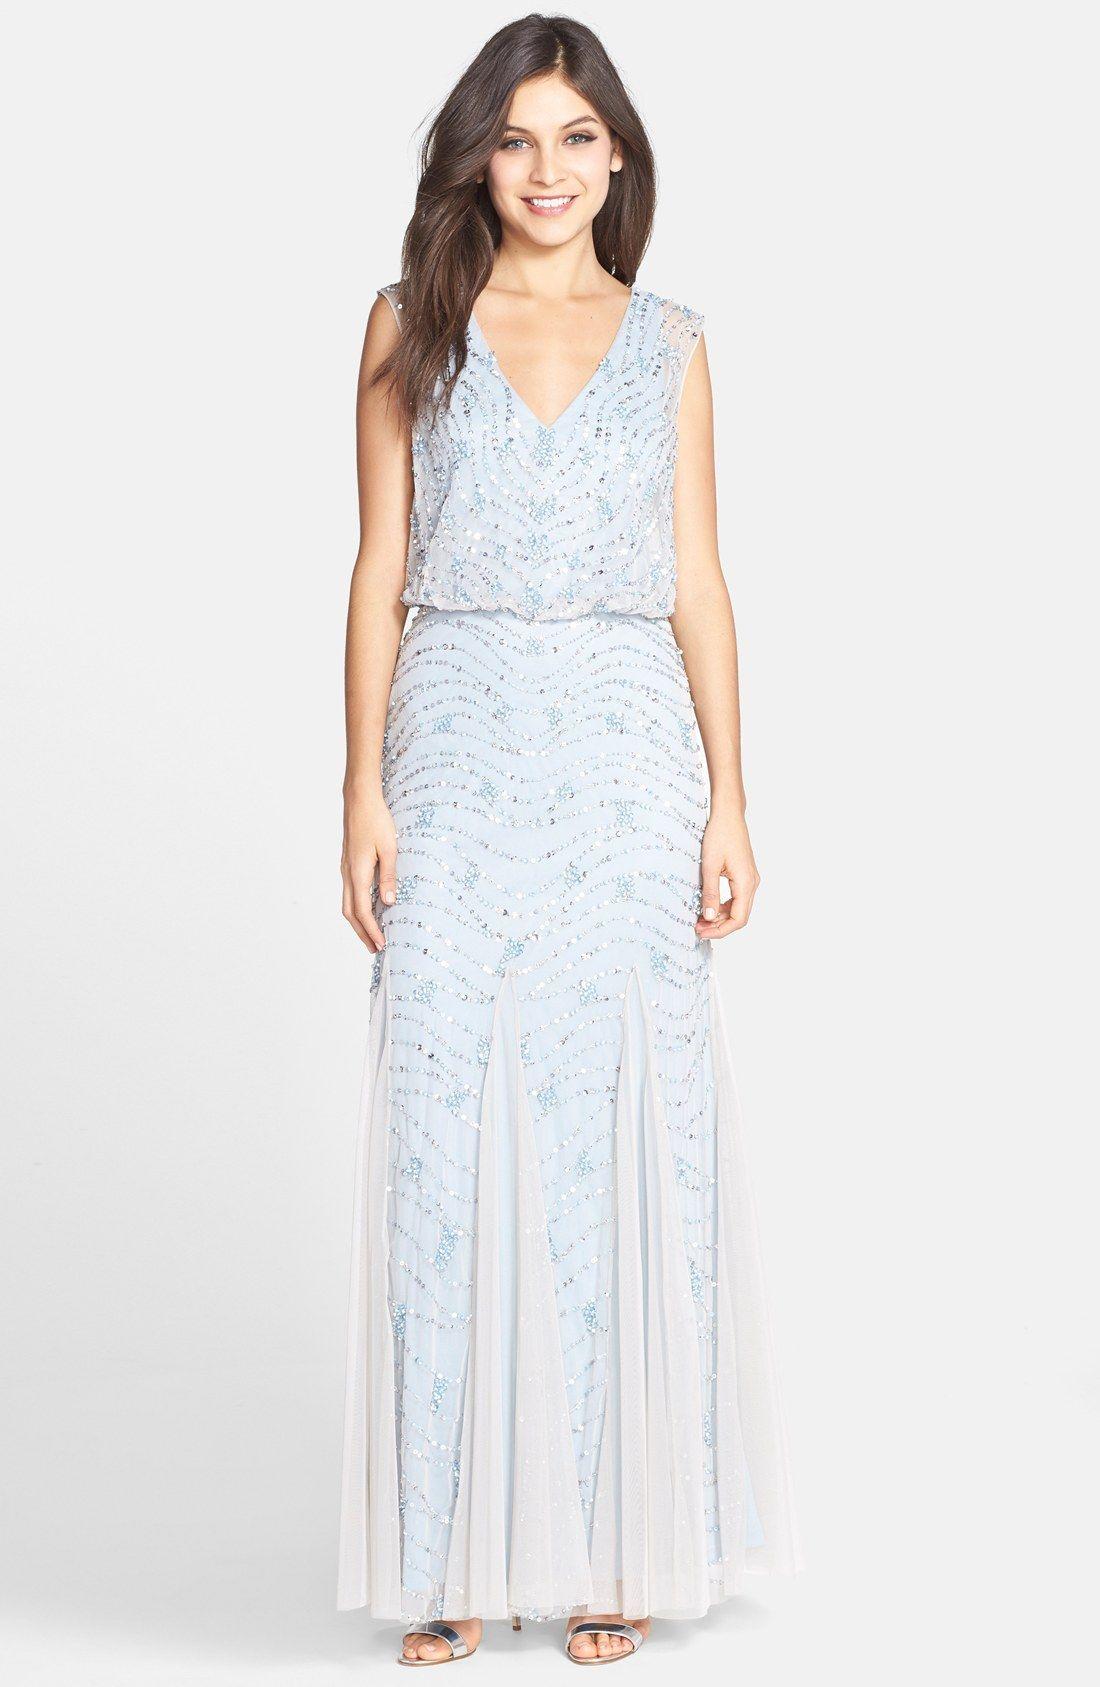 Aidan Mattox Embellished Lace Blouson Gown $450 | Dress to impress ...